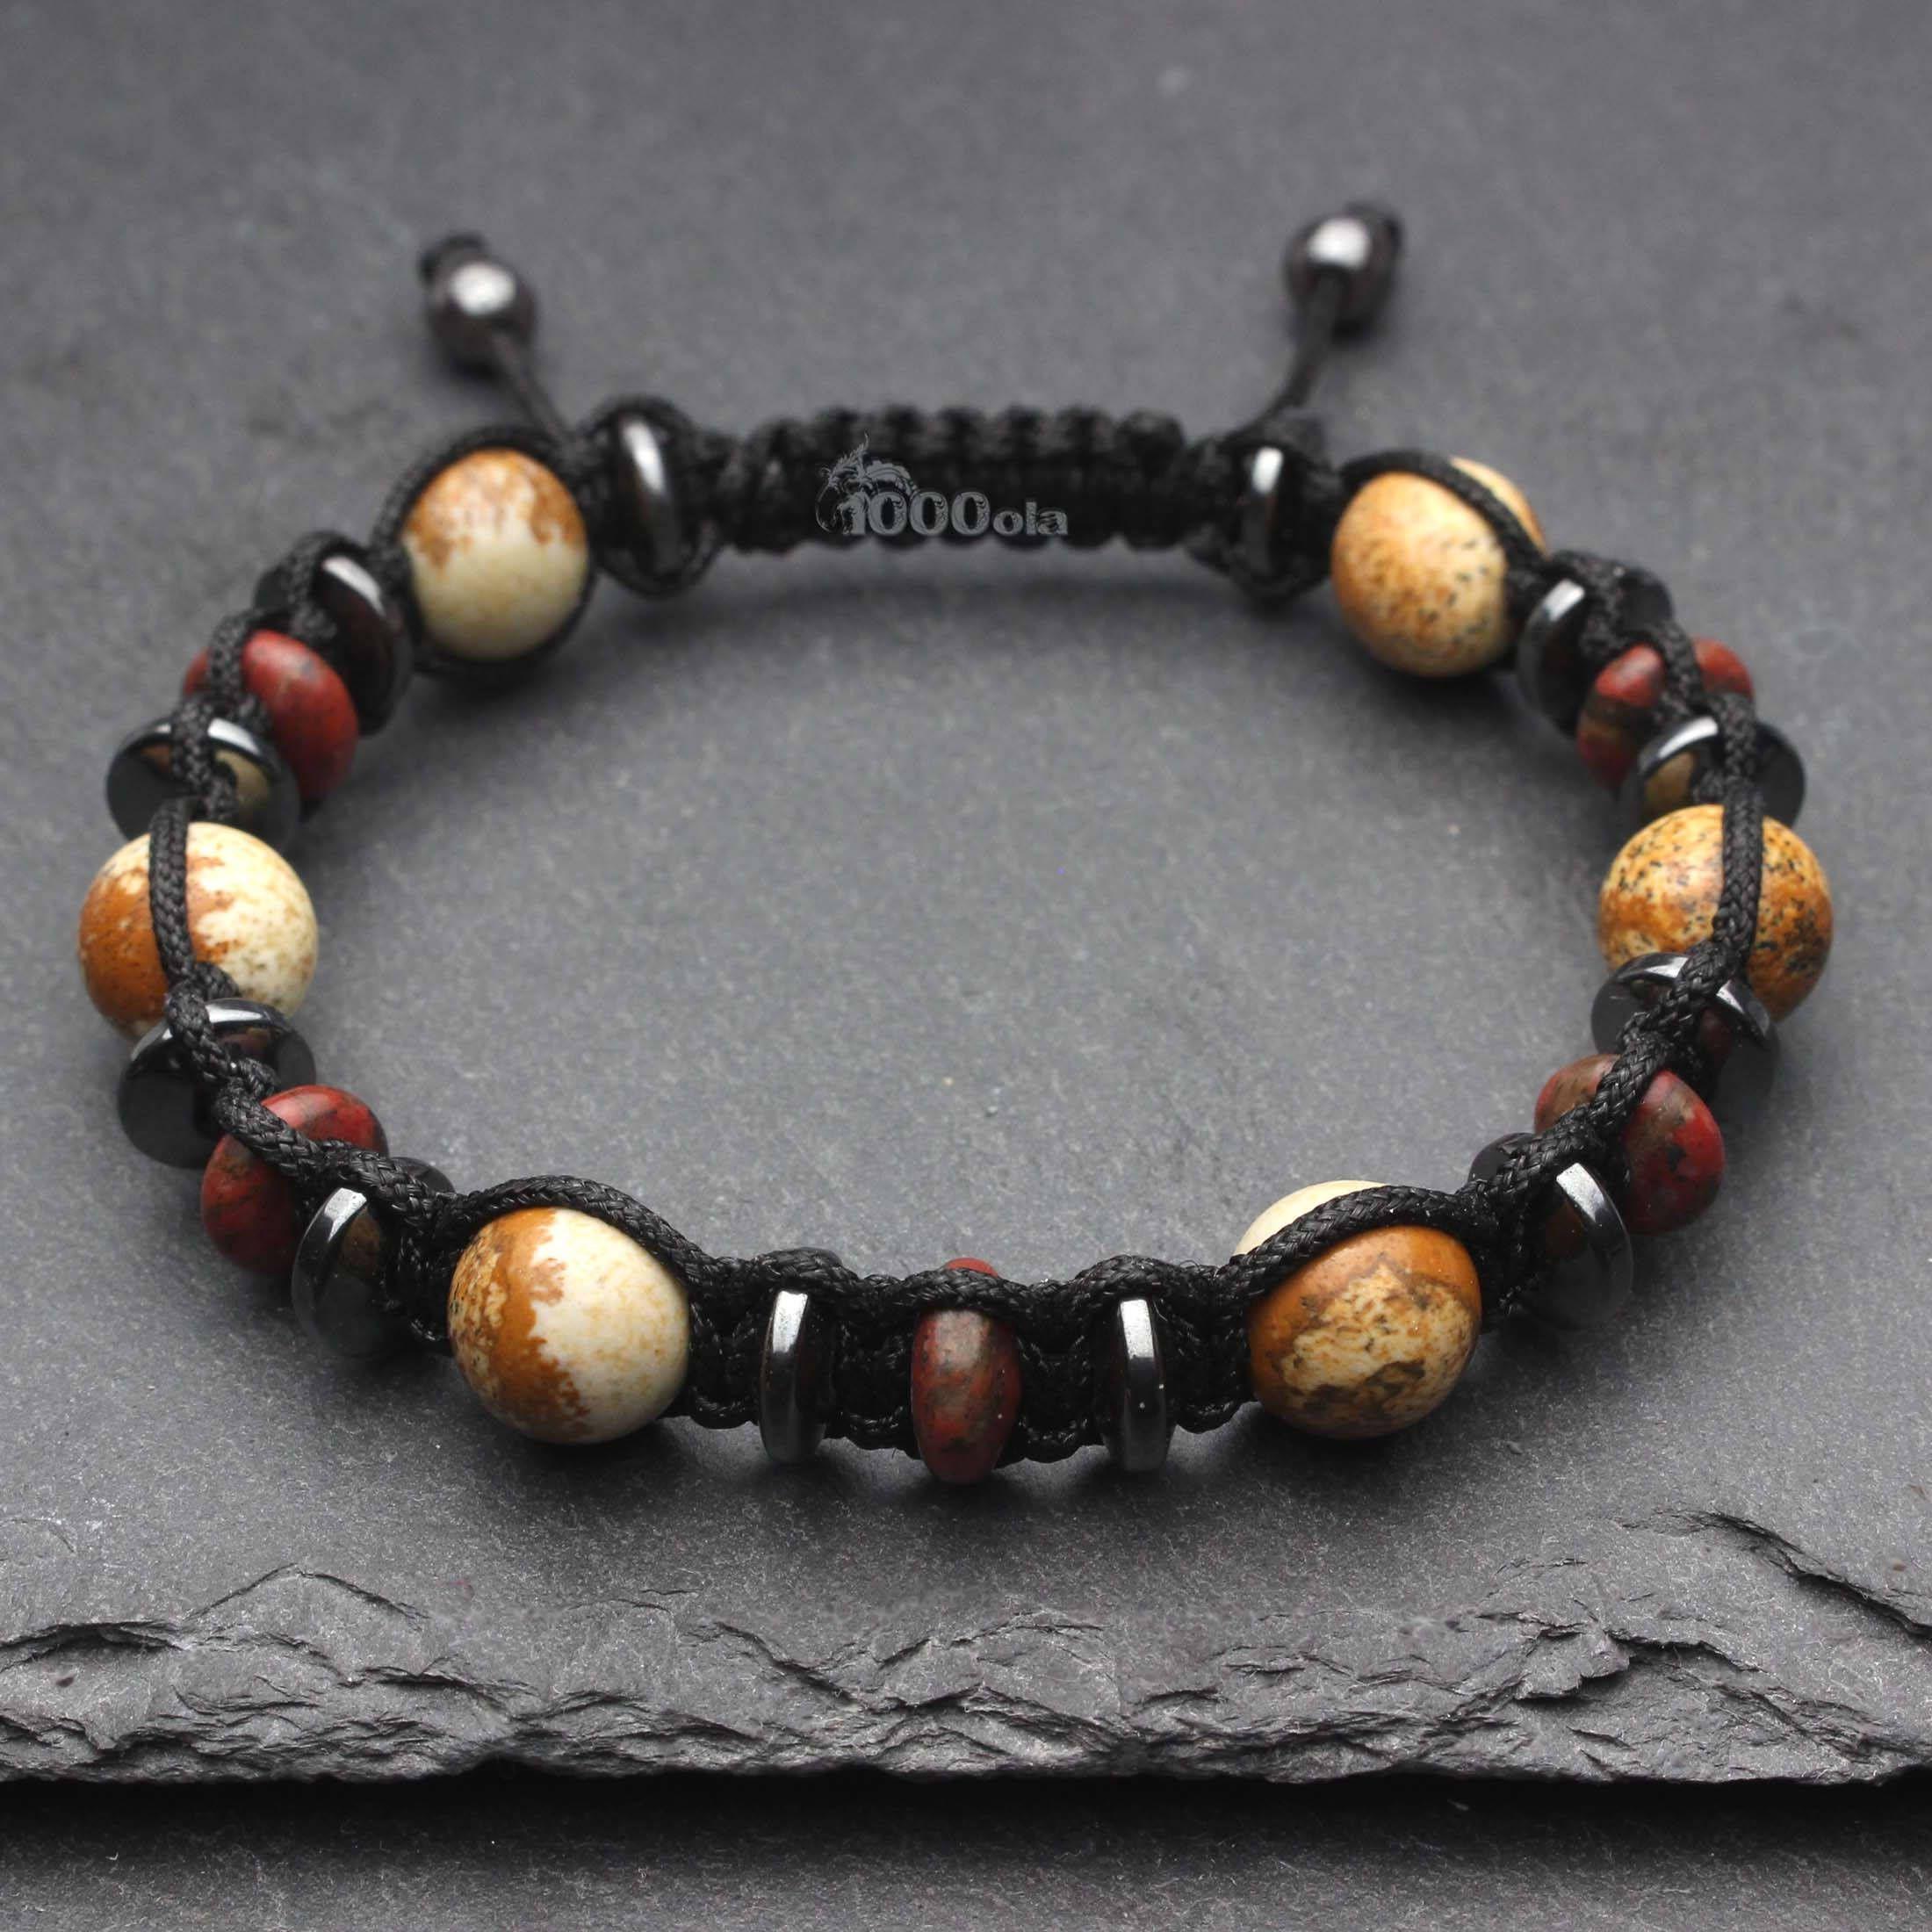 Fabriquer bracelet shamballa homme